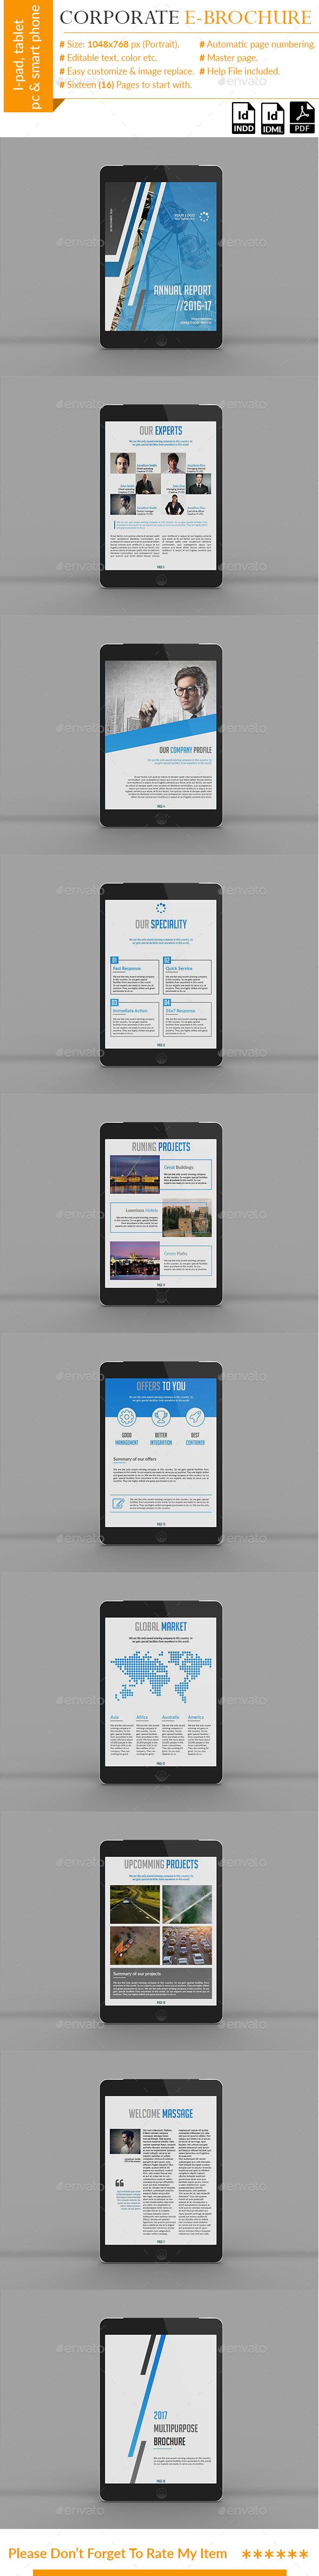 Corporate E-Brochure - Digital Books ePublishing